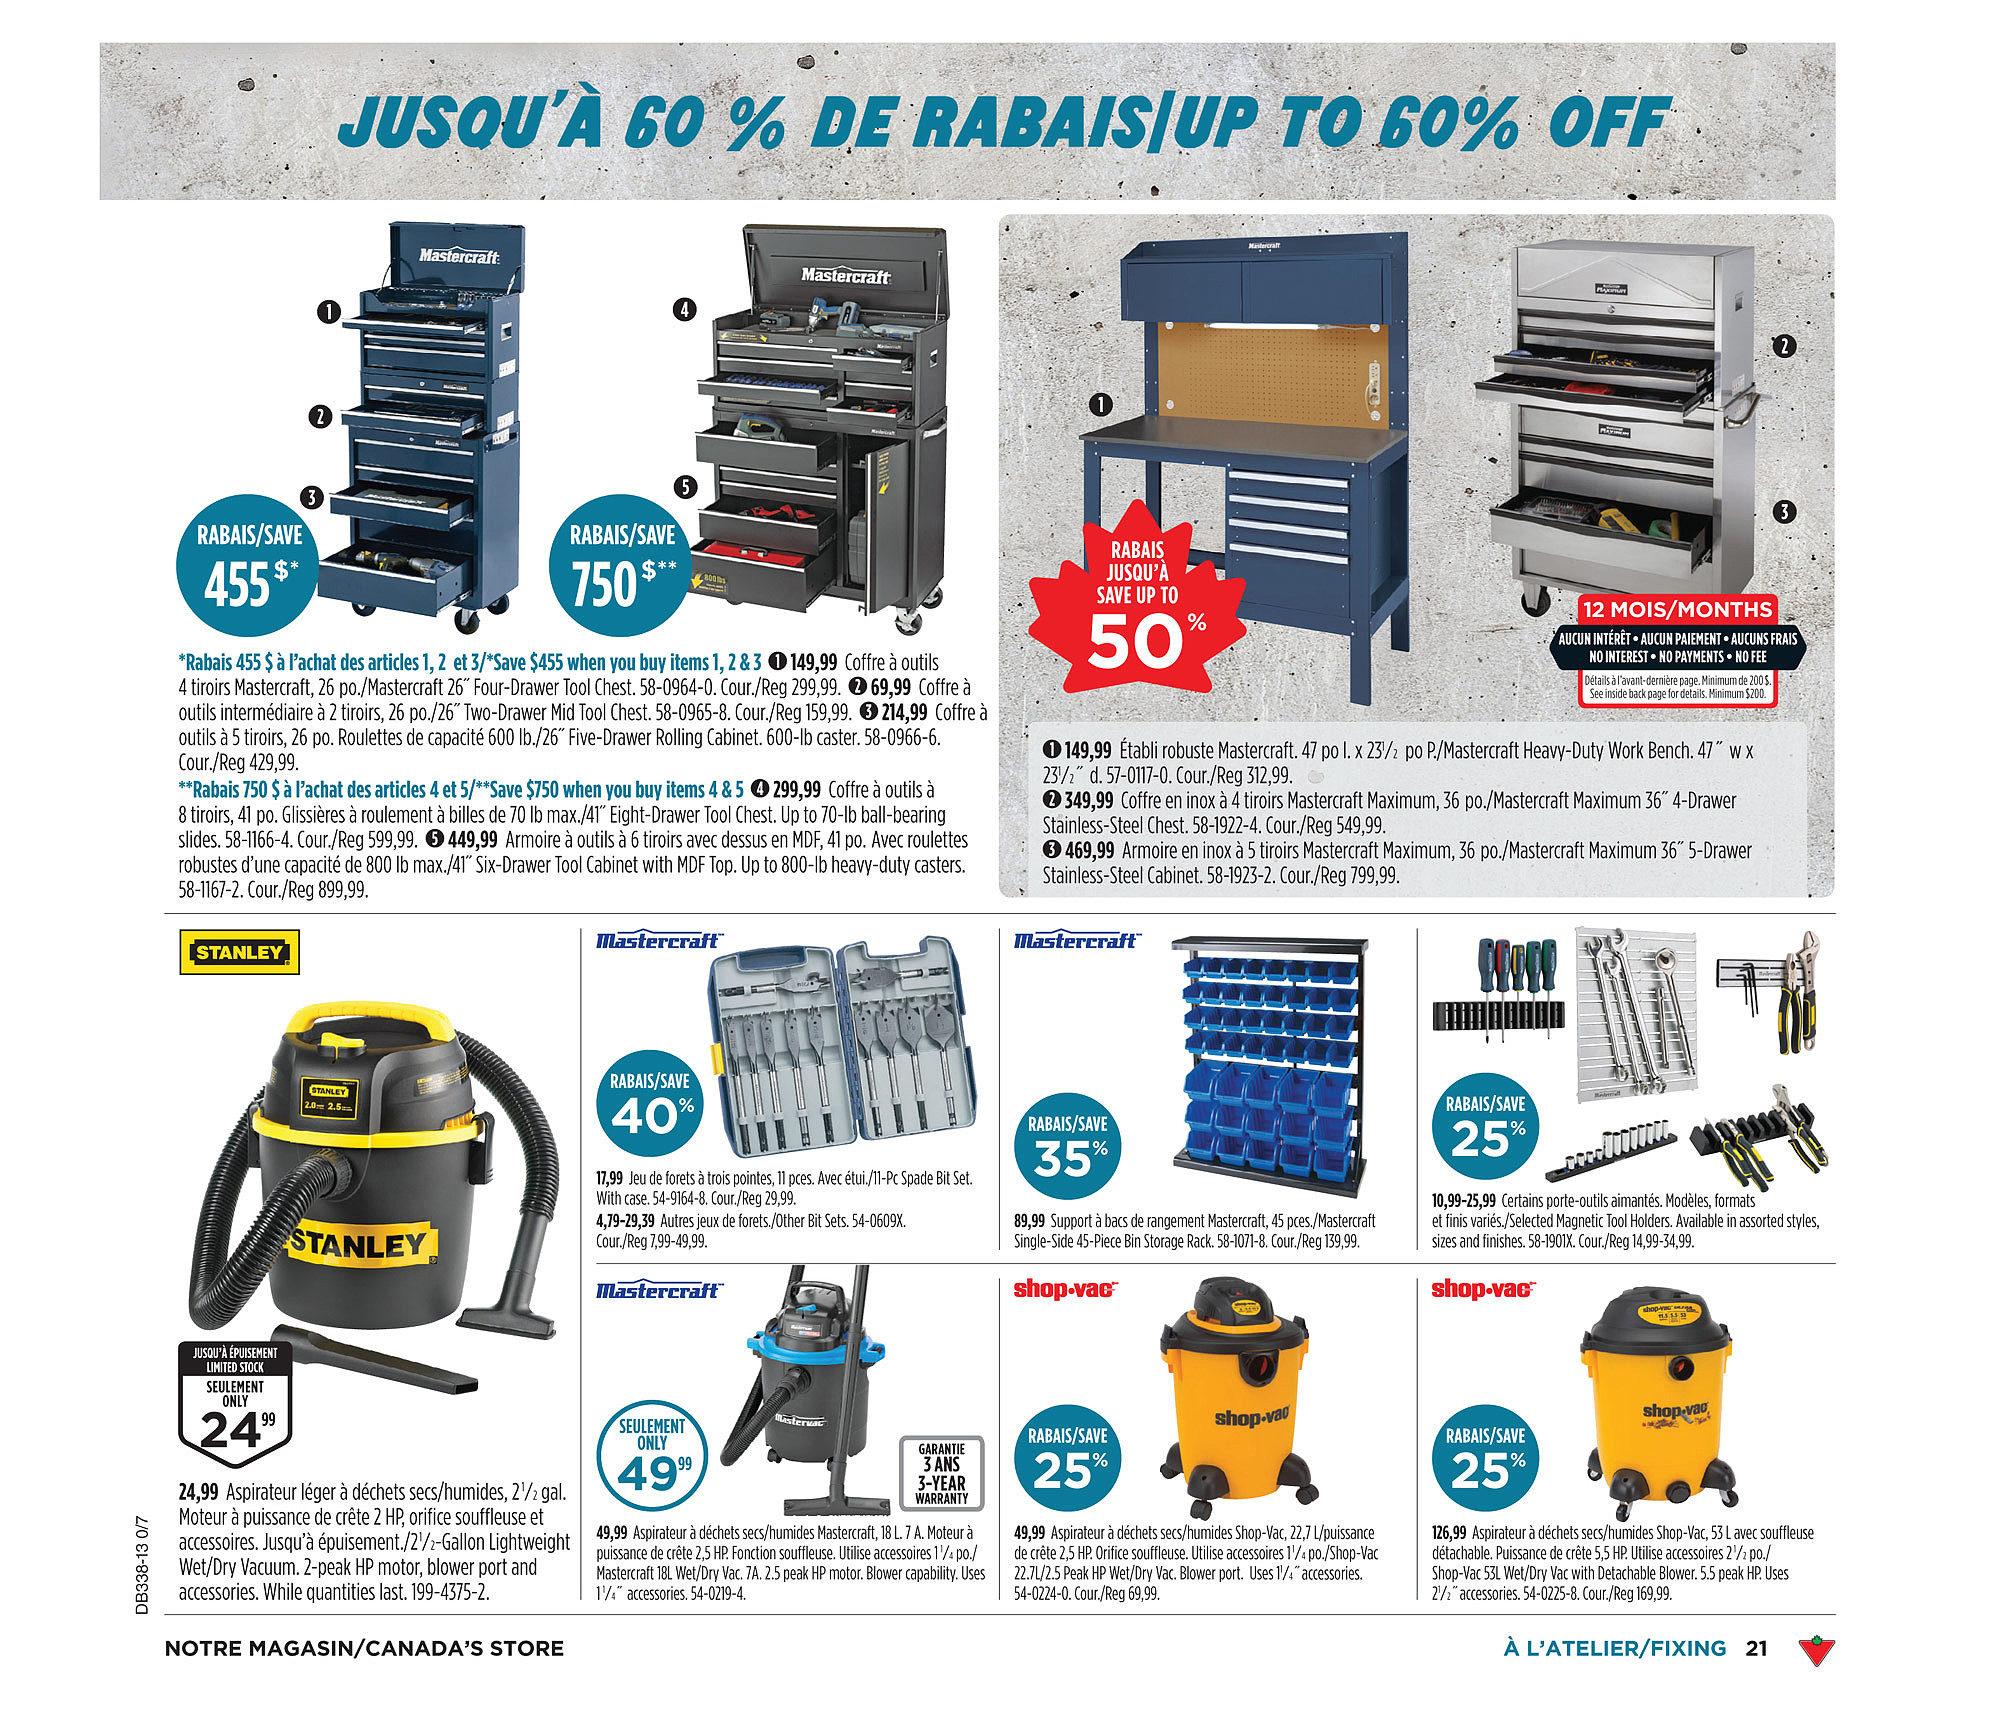 Canadian Tire Weekly Flyer - Weekly Flyer - Sep 12 – 19 - RedFlagDeals.com 7429ada93b7